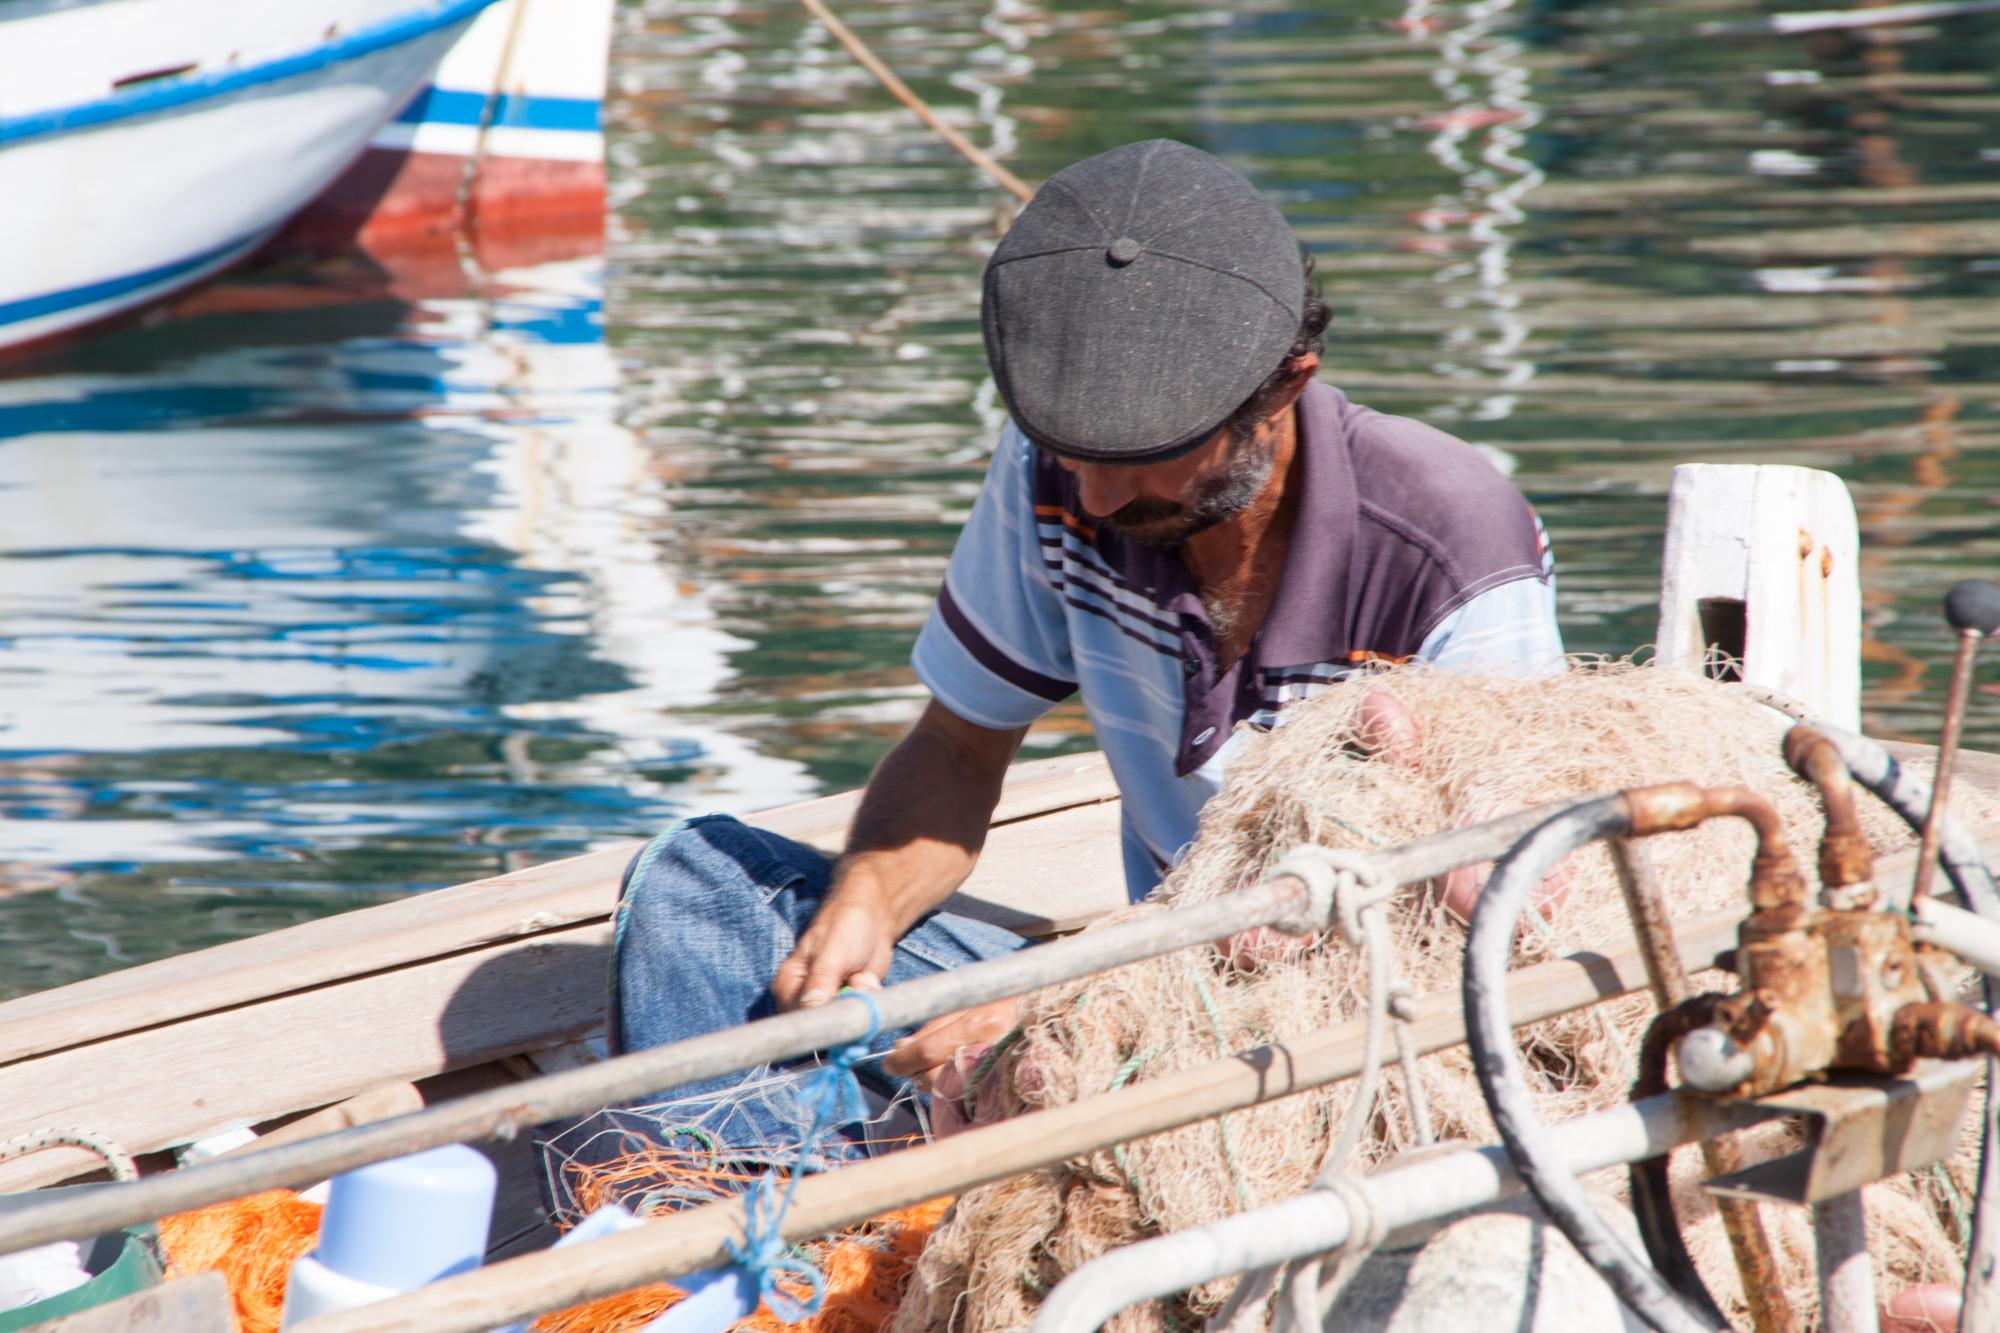 Fisherman mending his net in Anatalya